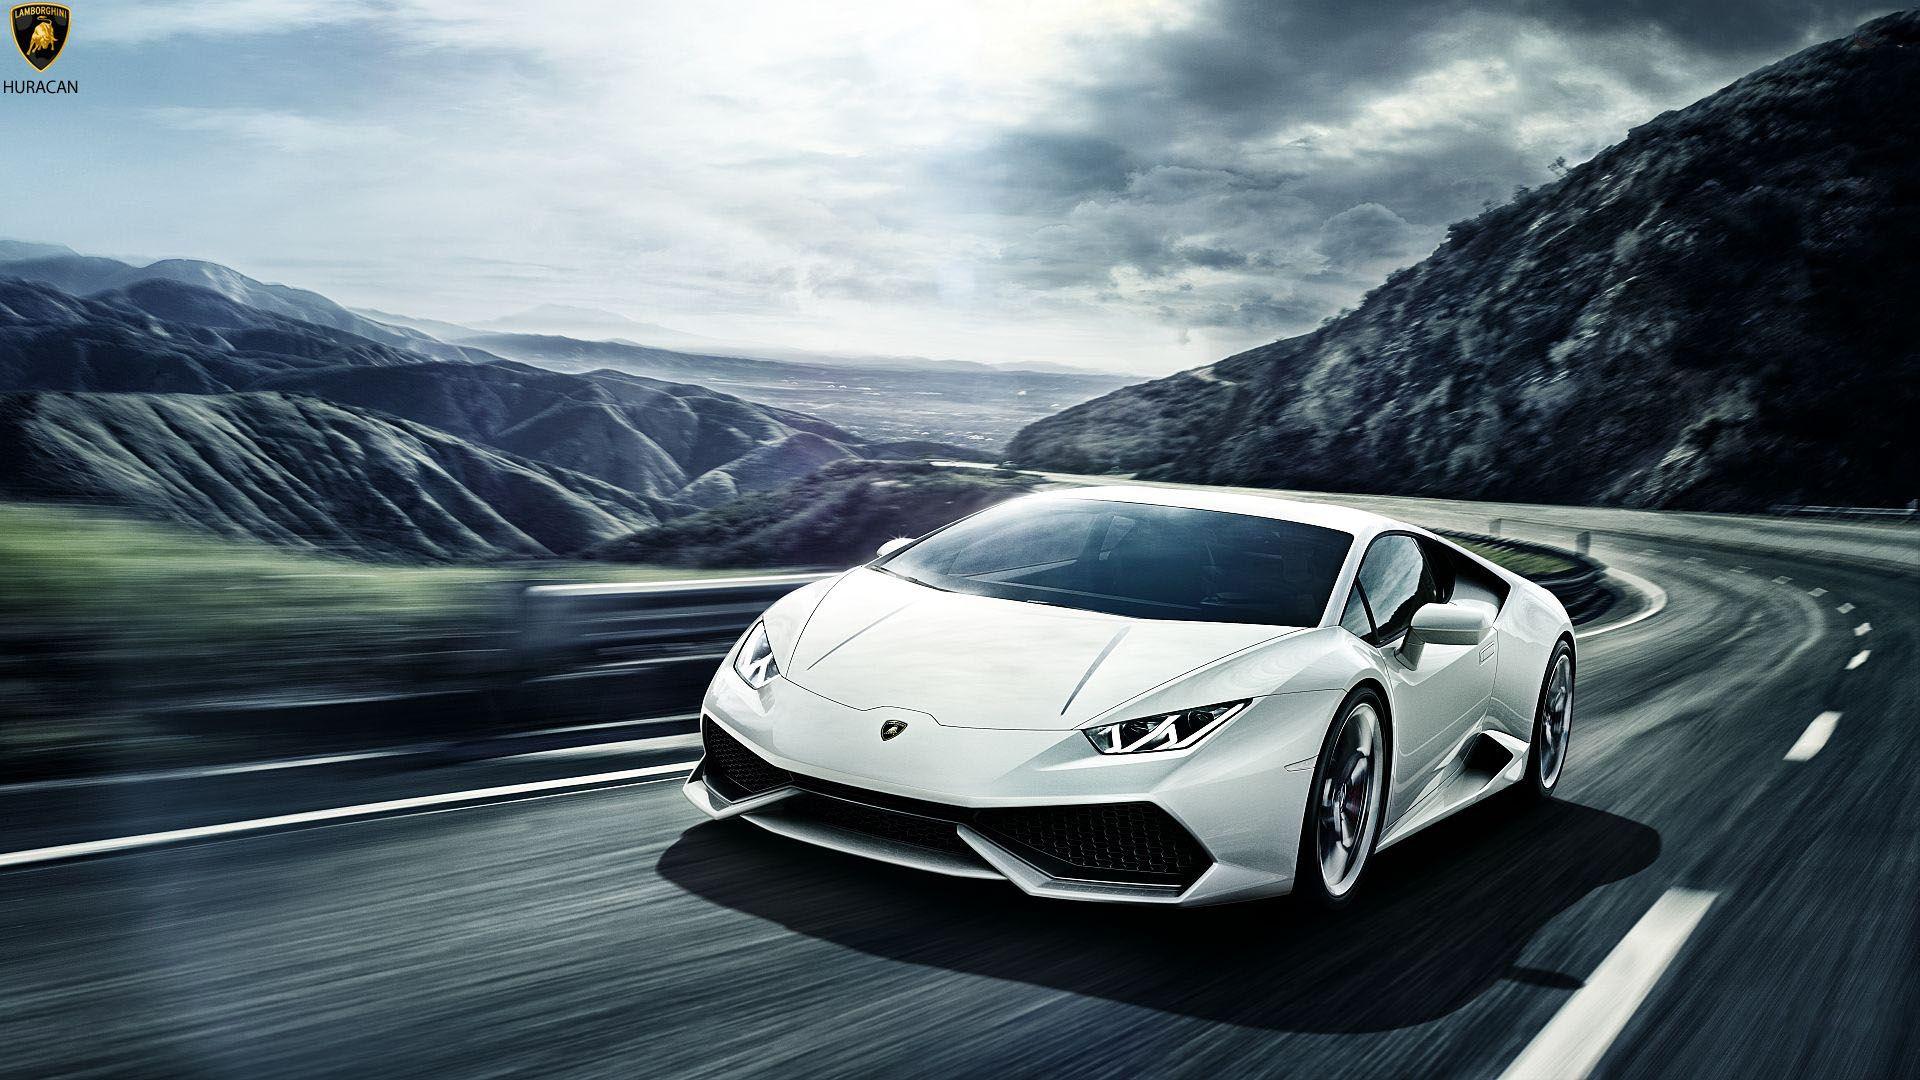 8103612db3735e52364d18343e656cdc Marvelous Lamborghini Huracan Price In Uae Cars Trend